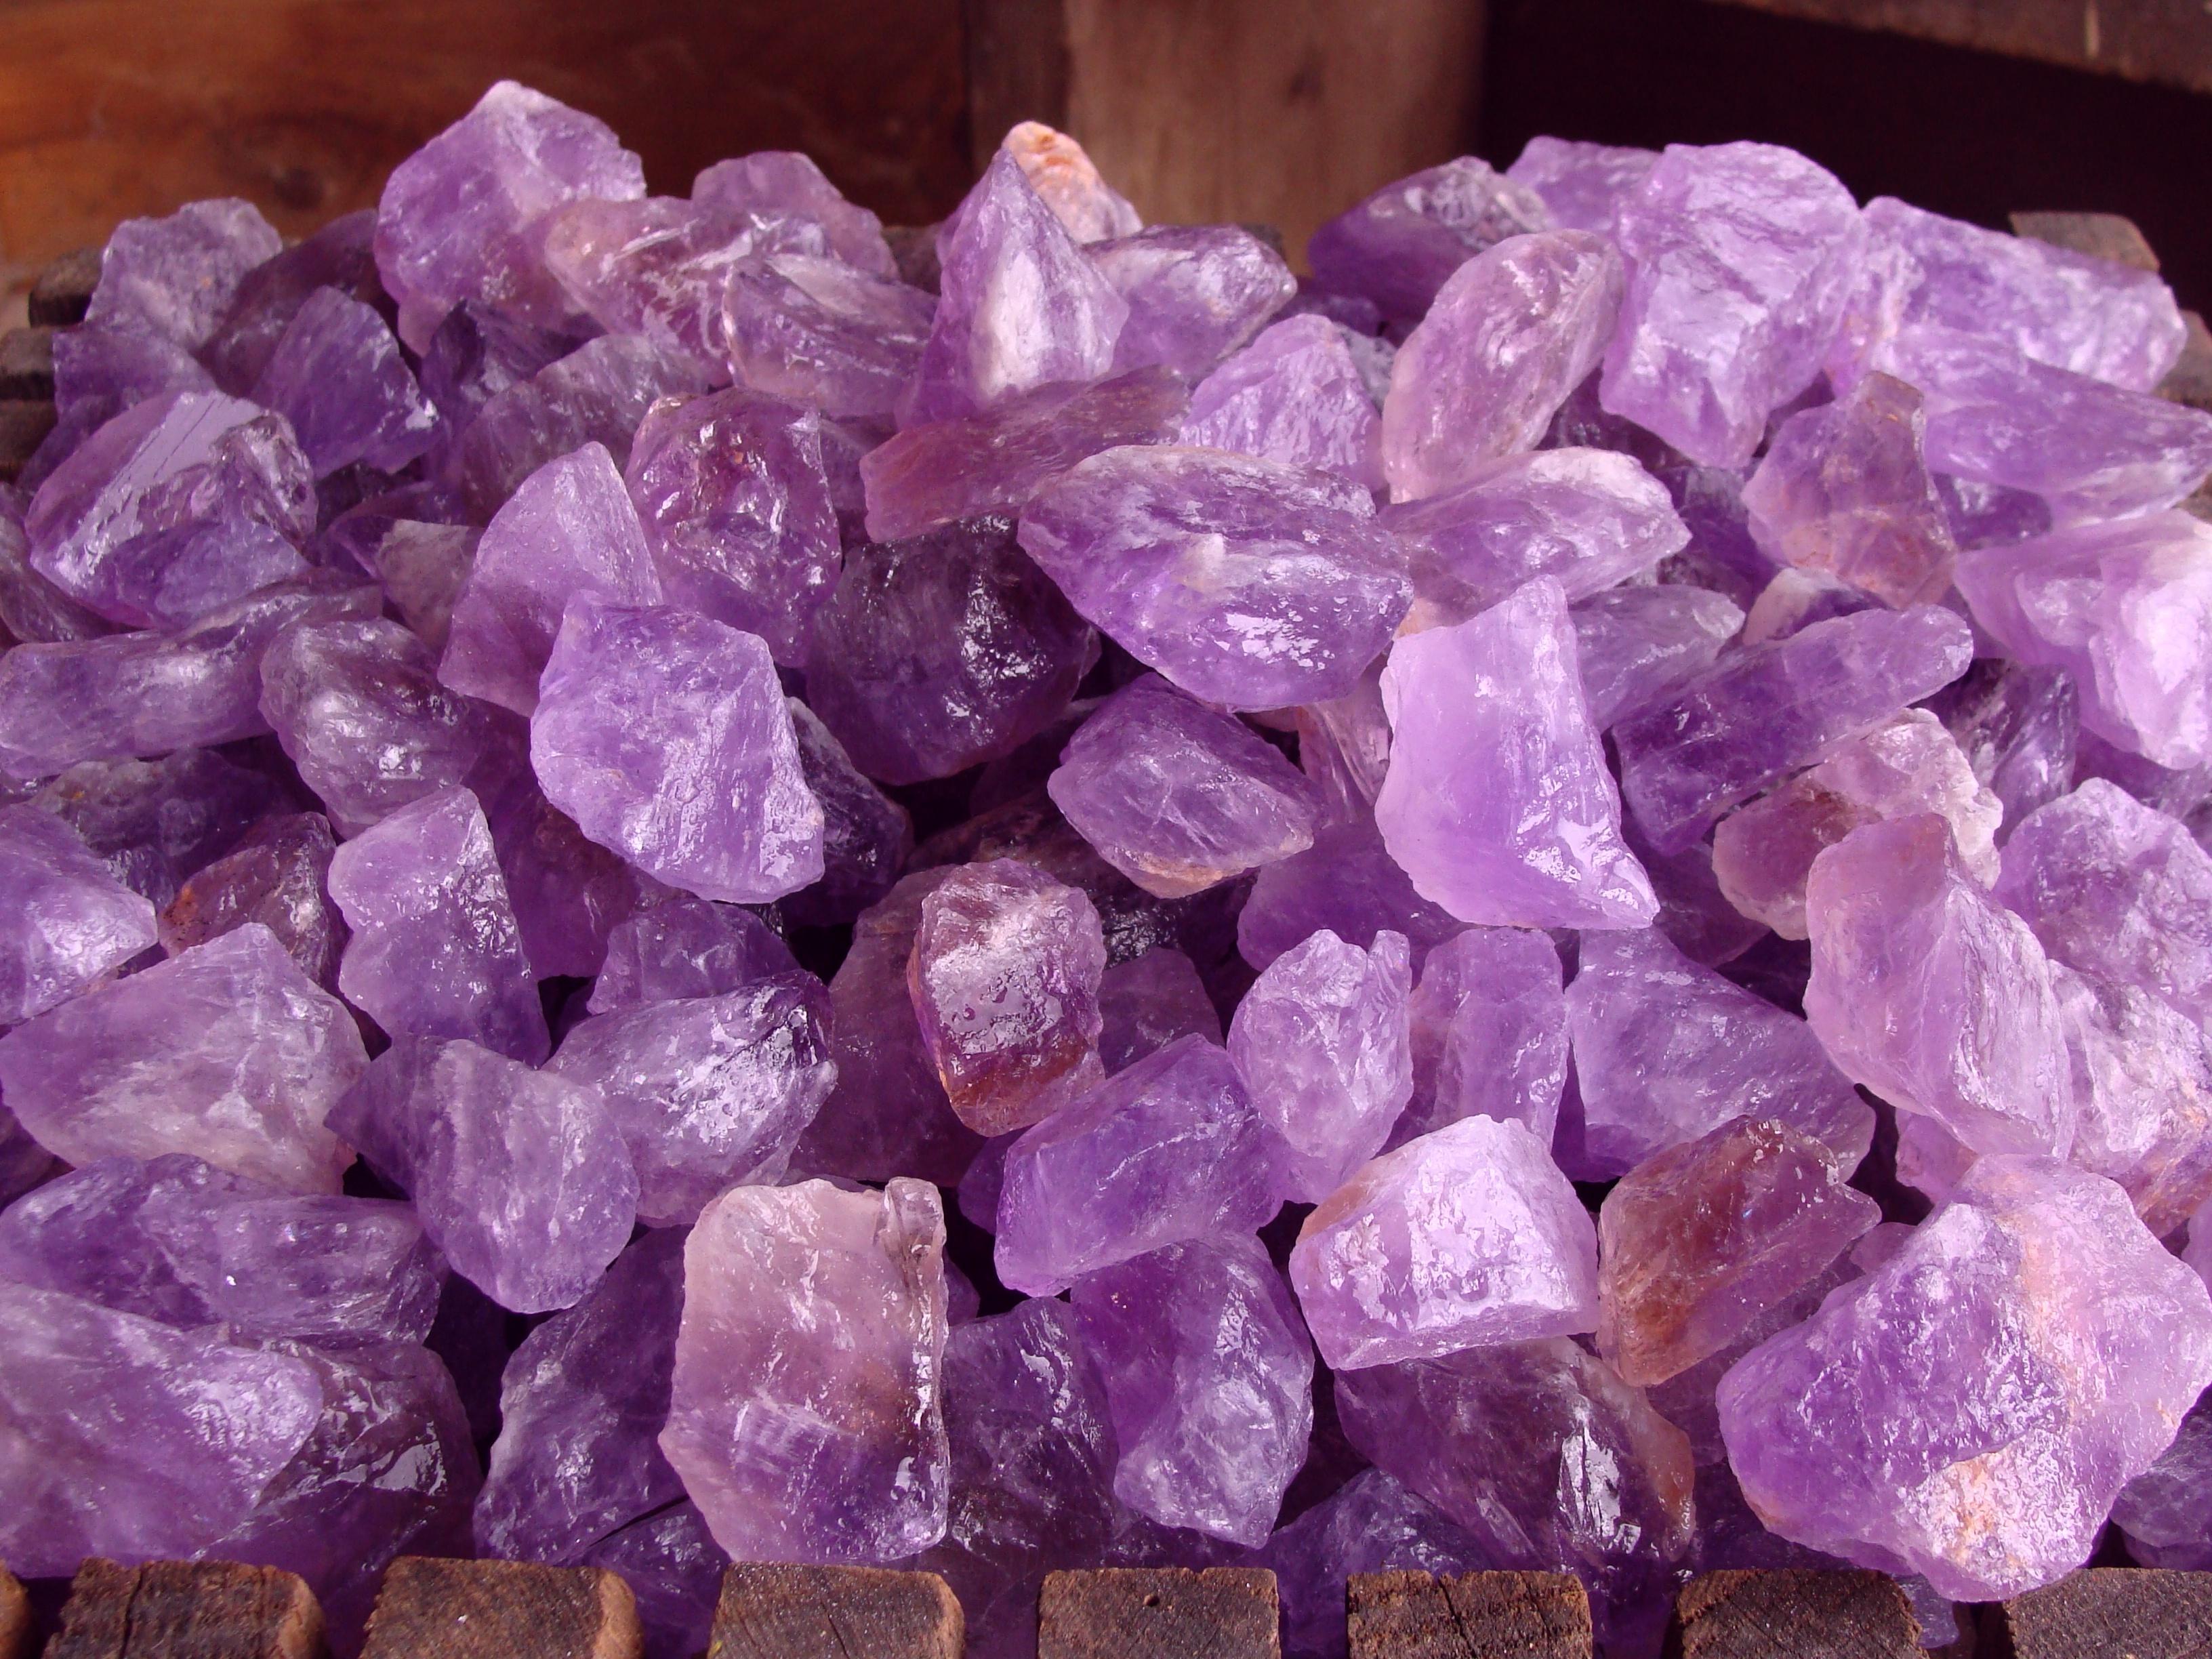 Amethyst Rocks | Tumbling Amethyst | Rough Minerals for Sale